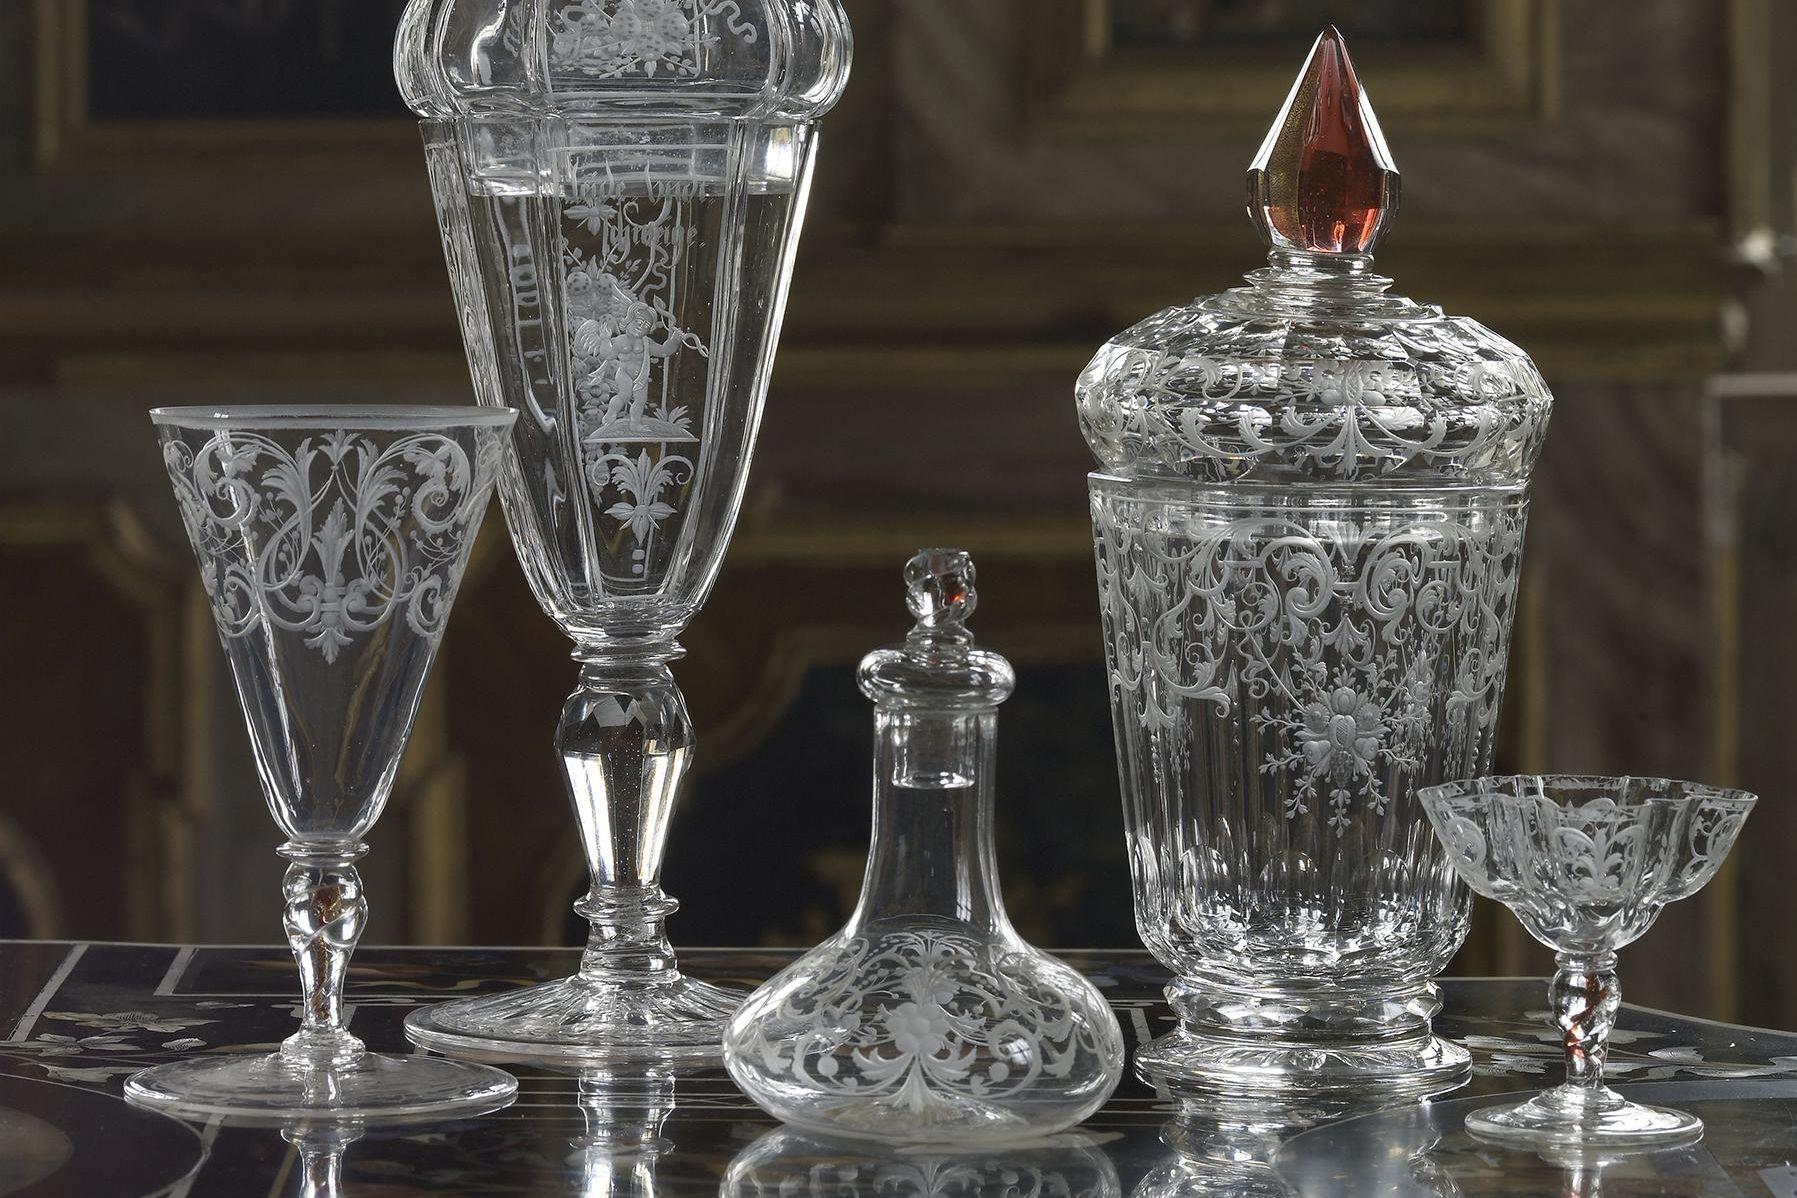 Schloss Rastatt Favorite, historische Glassammlung